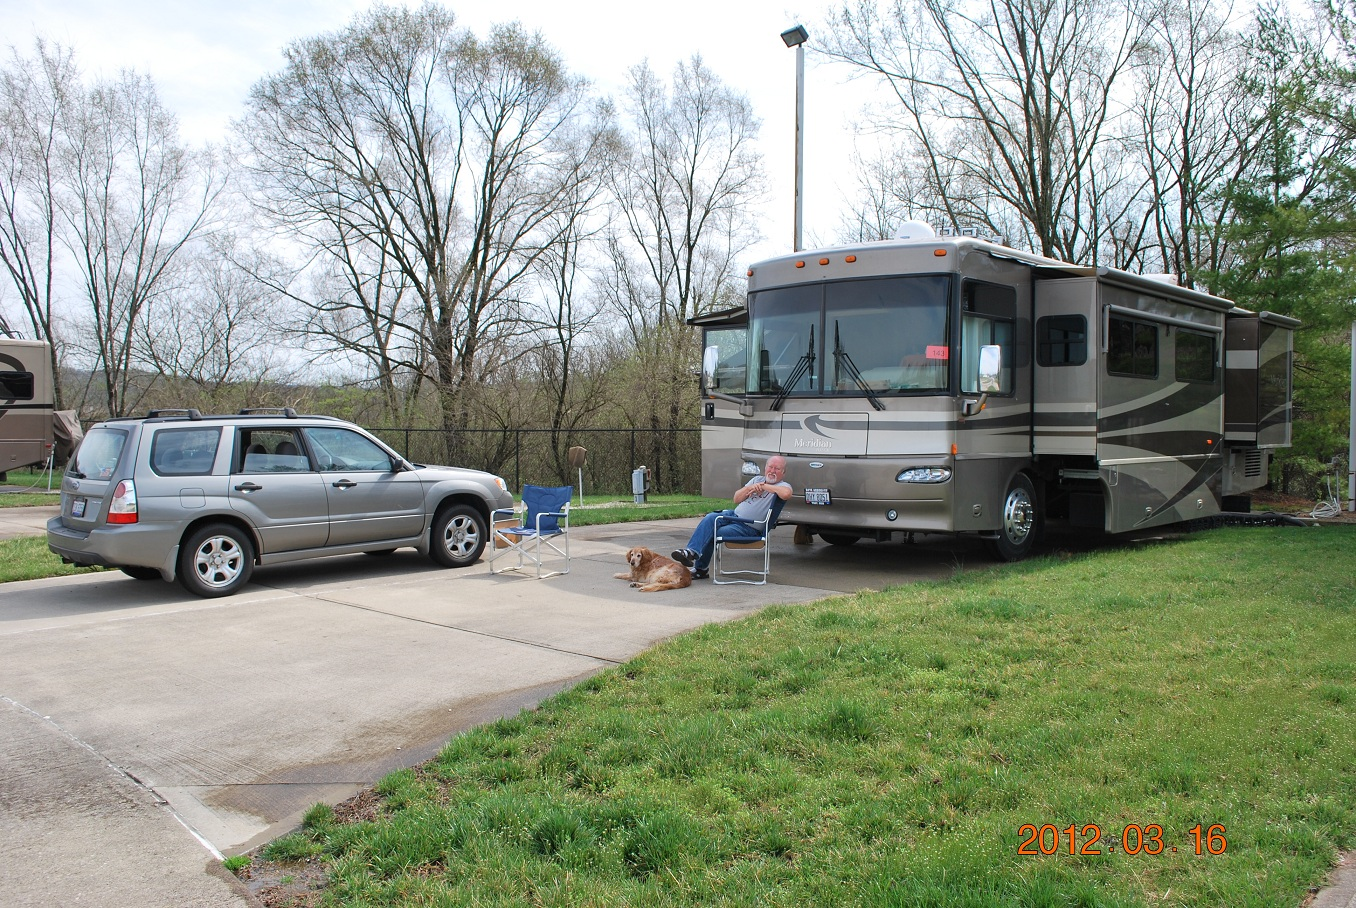 Mobile Retirement Cottage Mrc Family Motor Coach